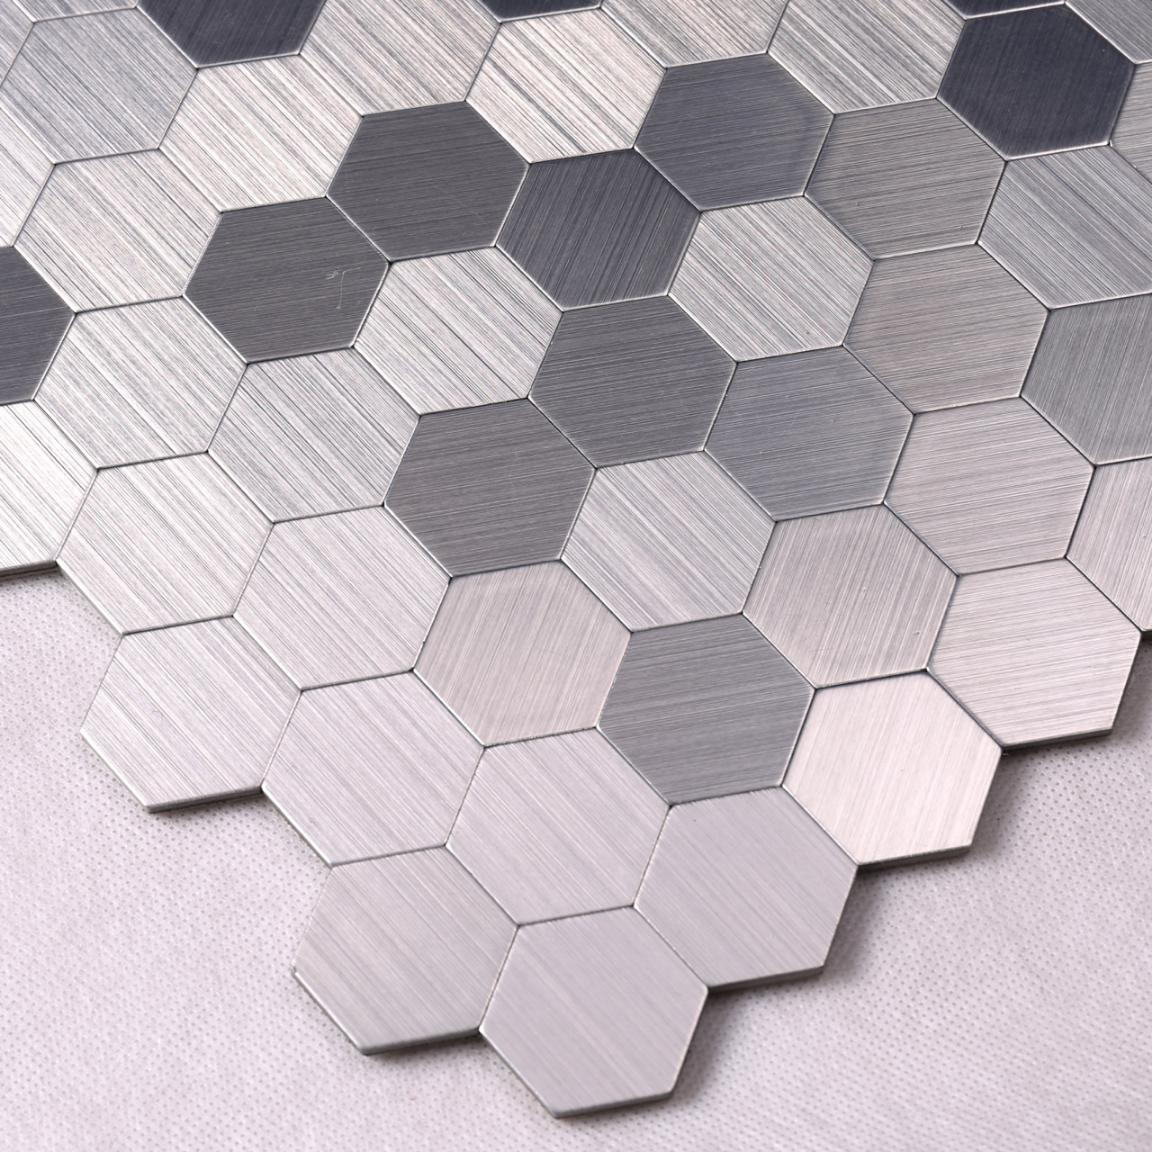 3D Hexagon Metal Mosaic Tile for Backsplash Decoration